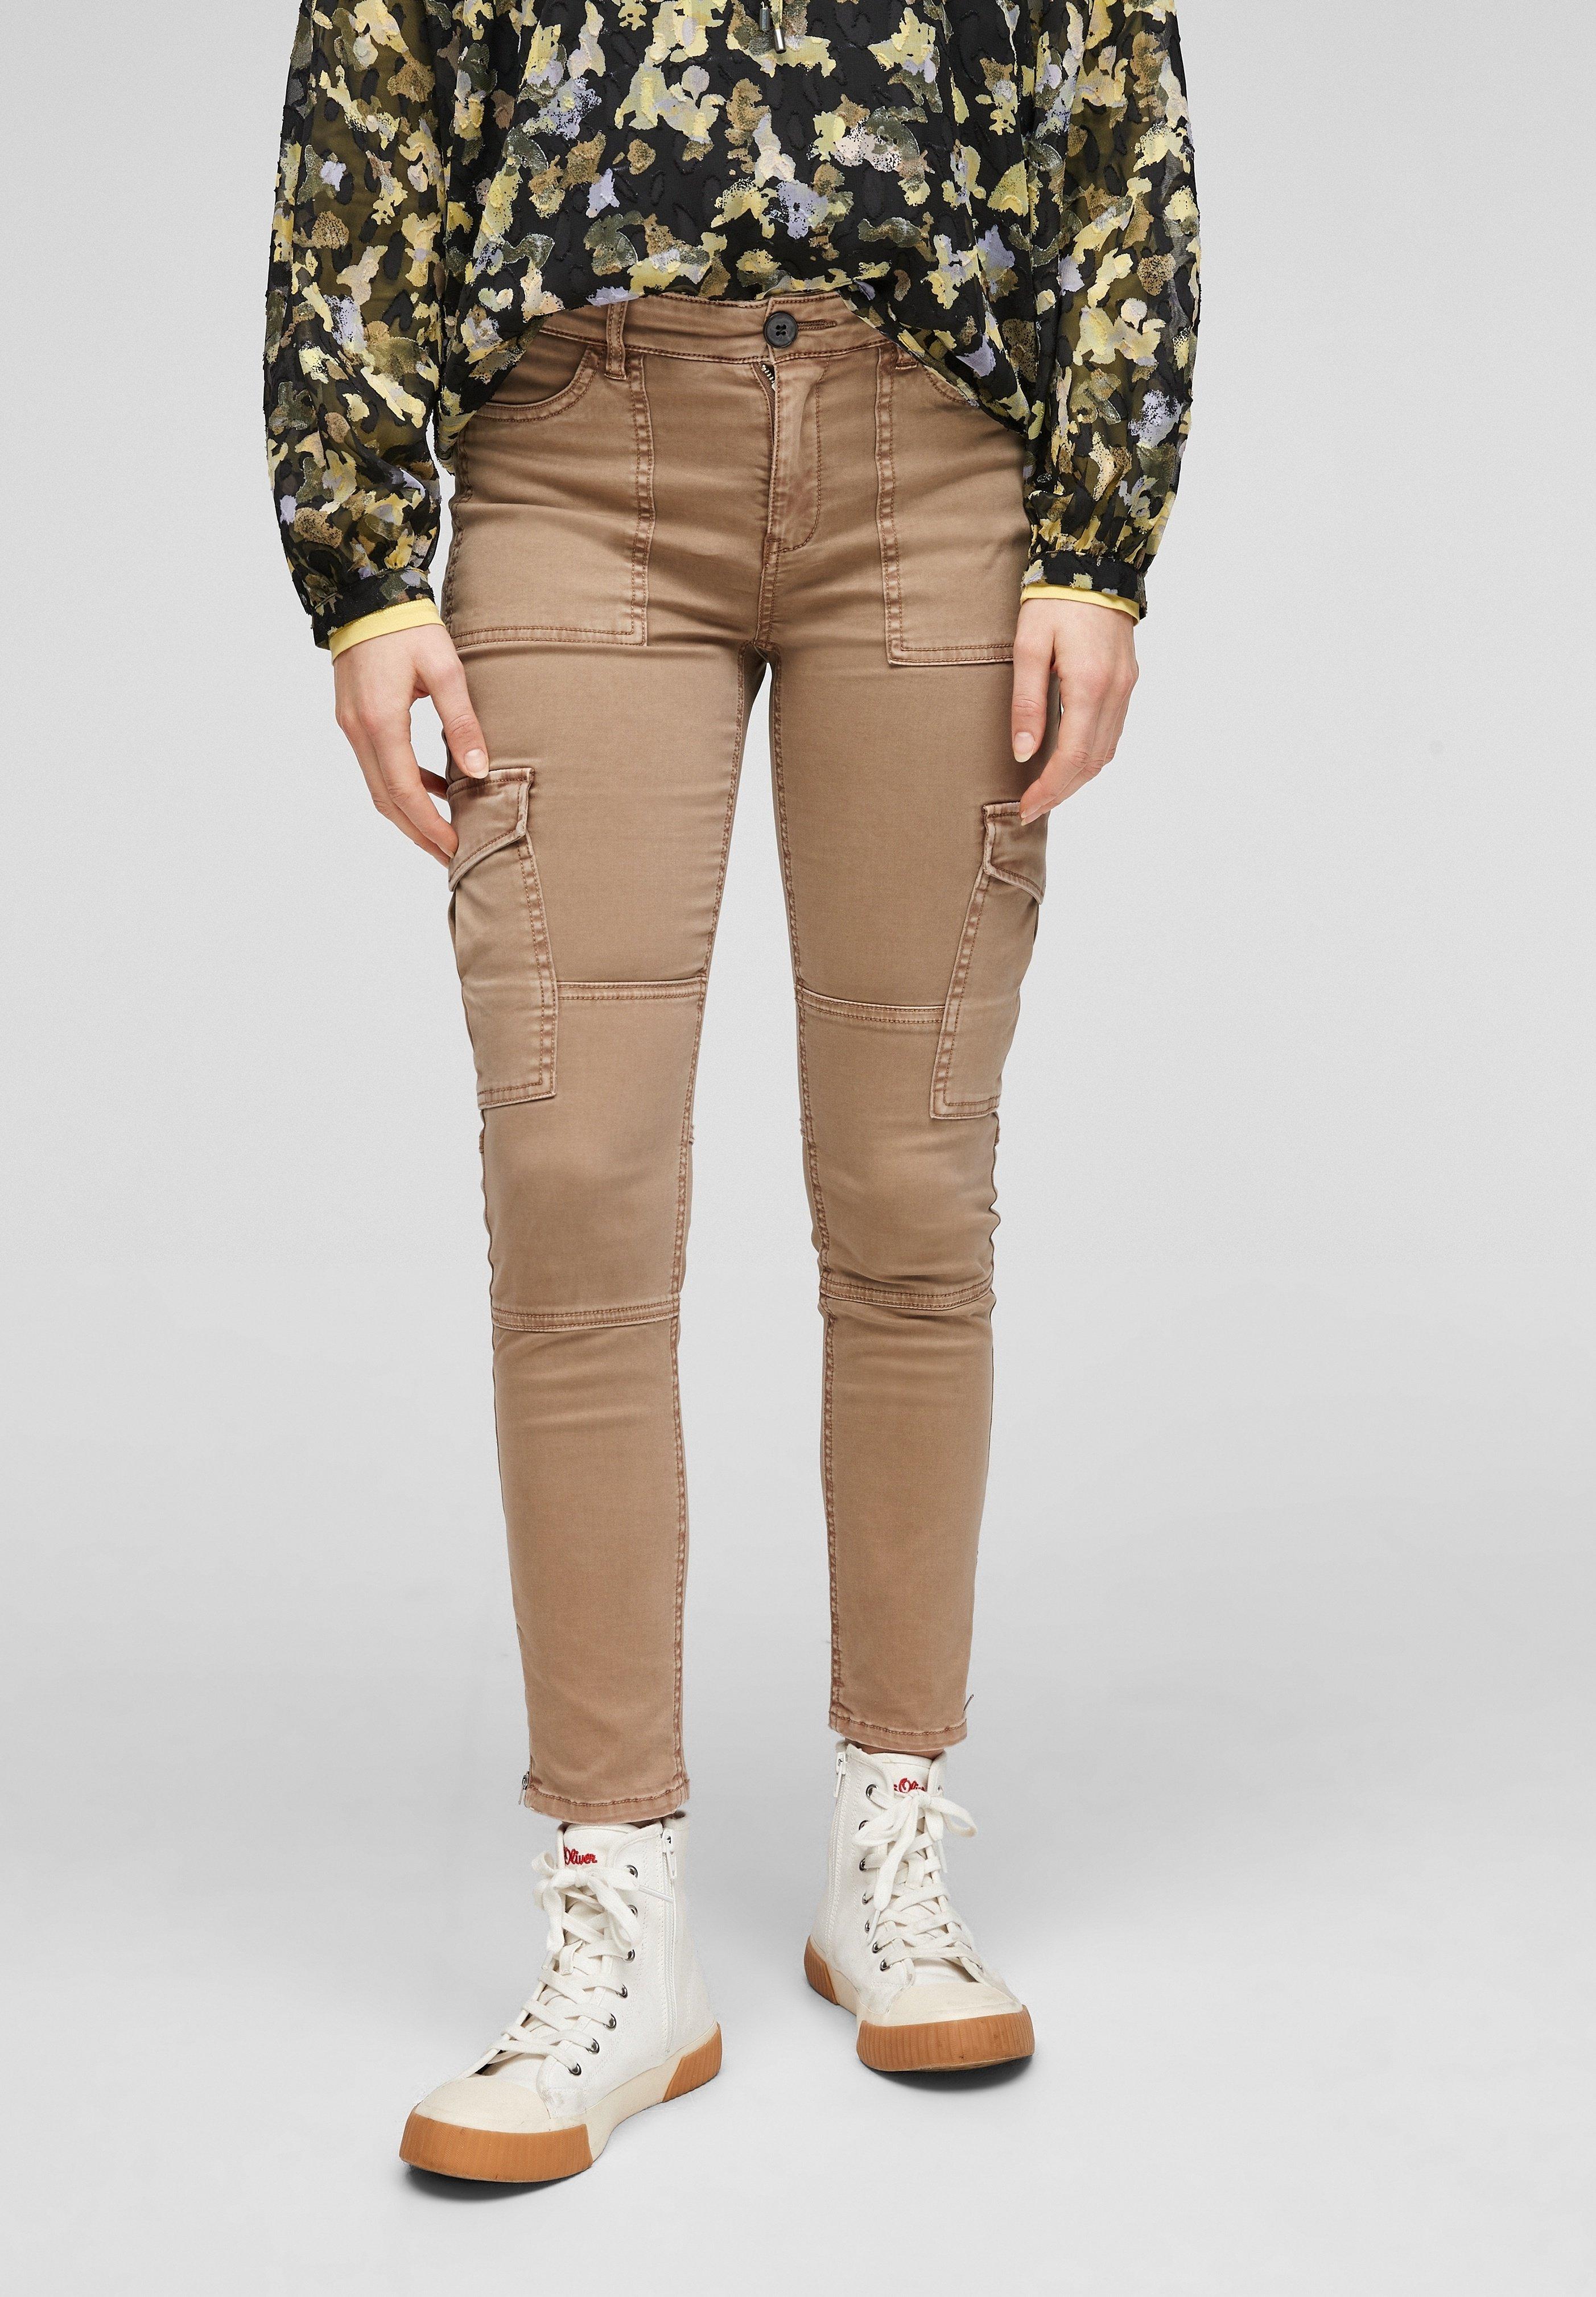 Femme SKINNY FIT - Pantalon cargo